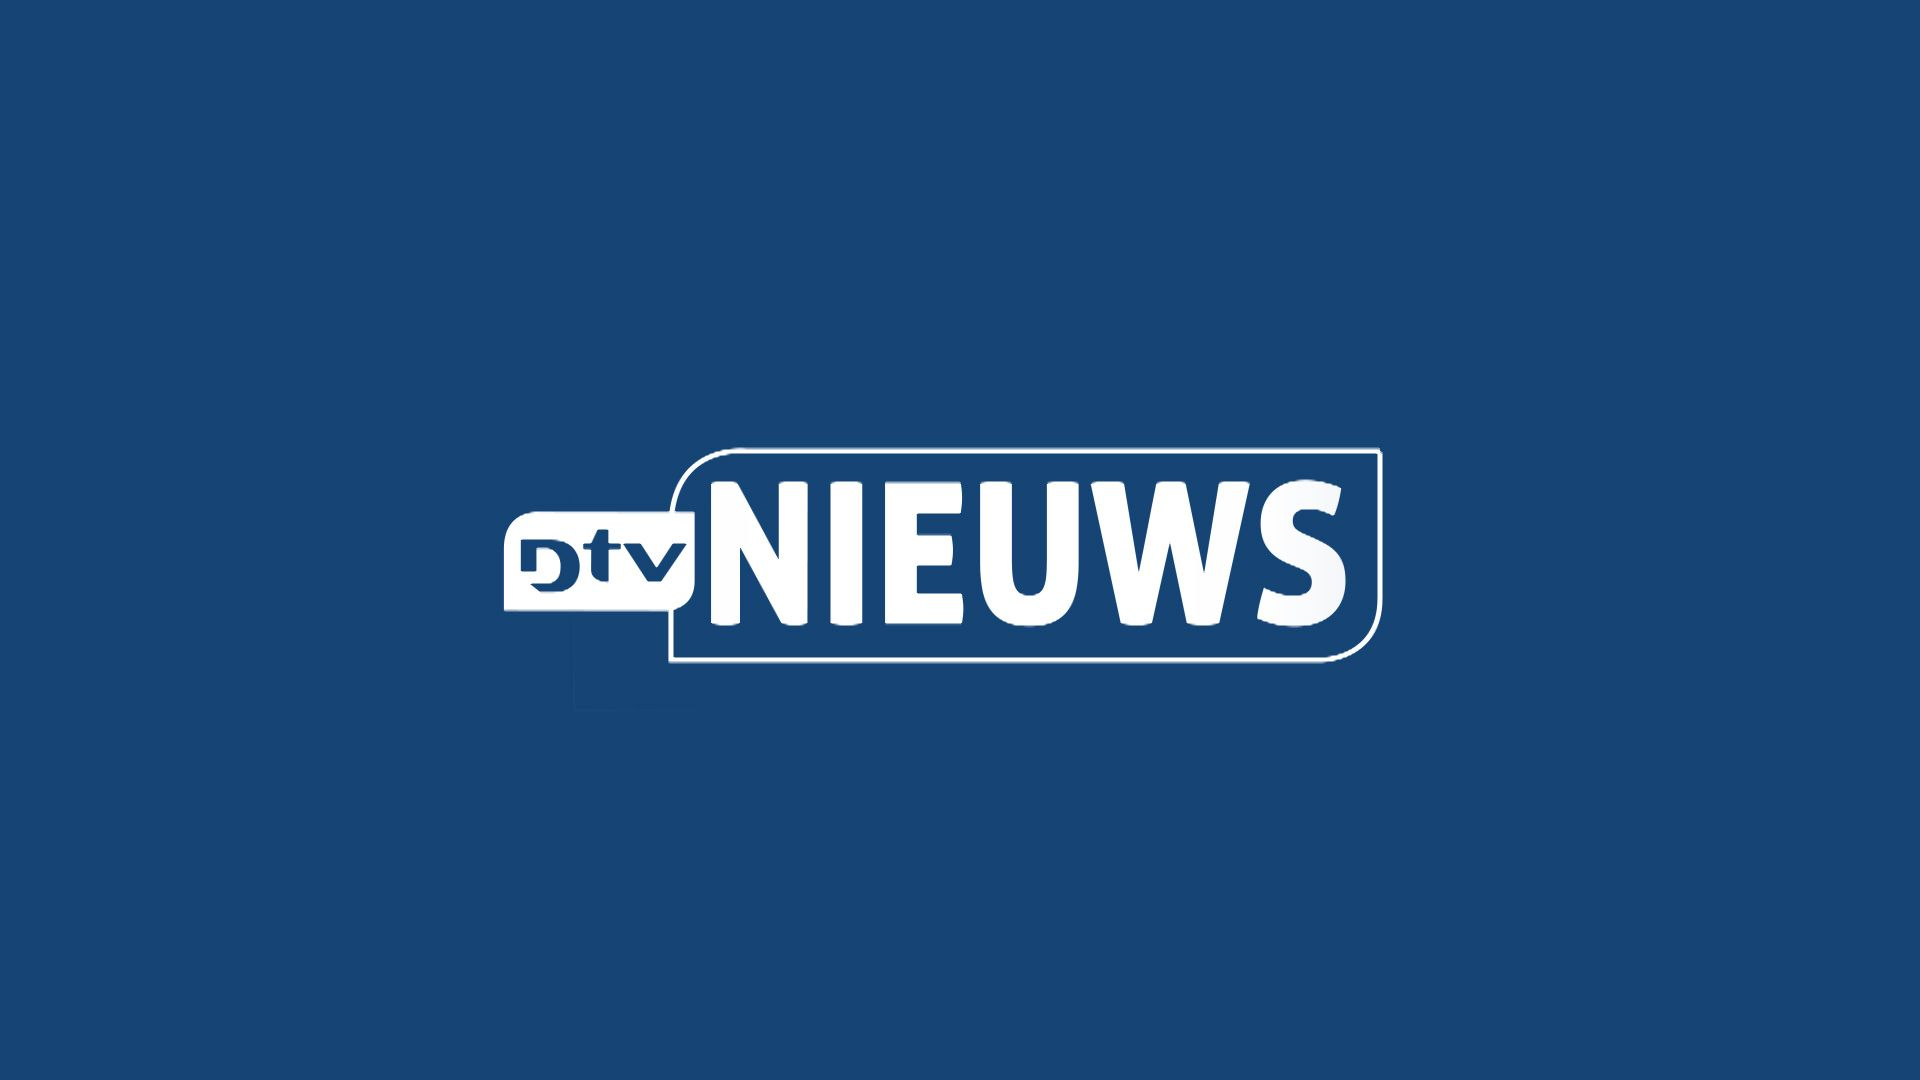 logo dtv nieuws.jpg